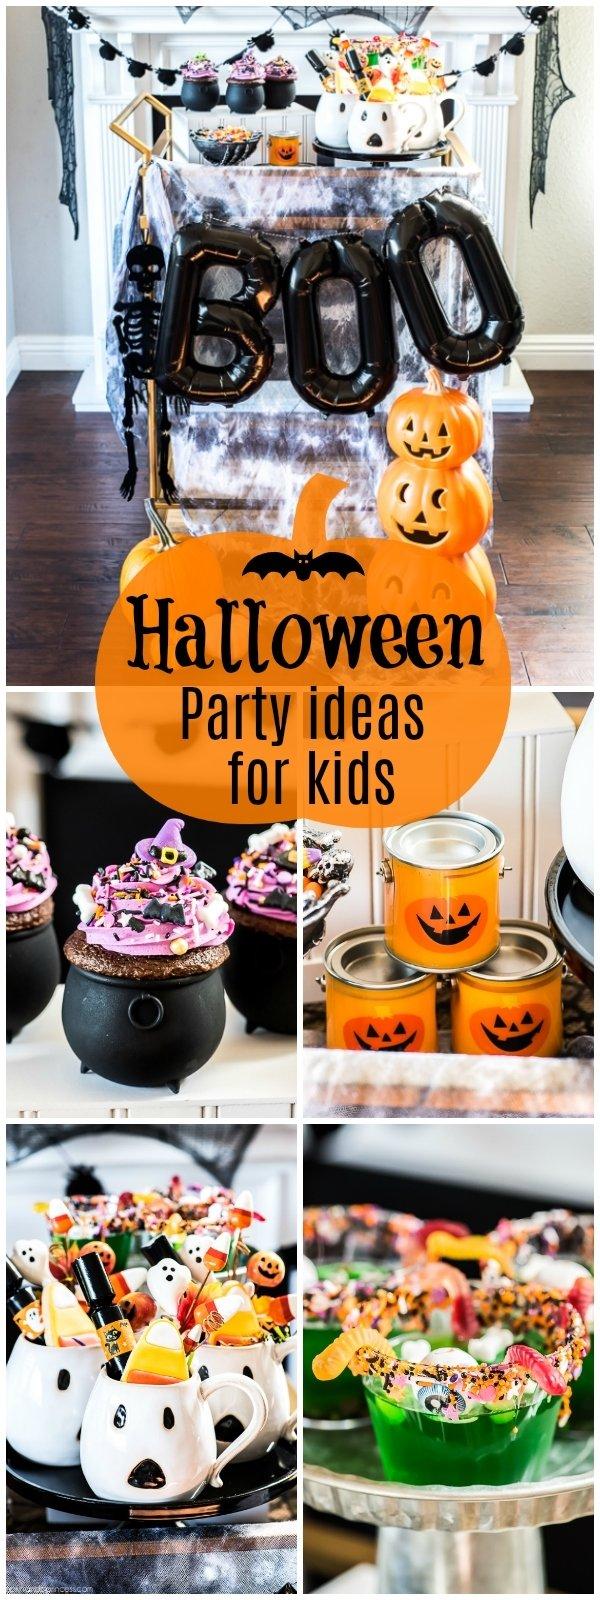 10 Trendy Halloween Birthday Party Ideas For Kids halloween party ideas kids 2021